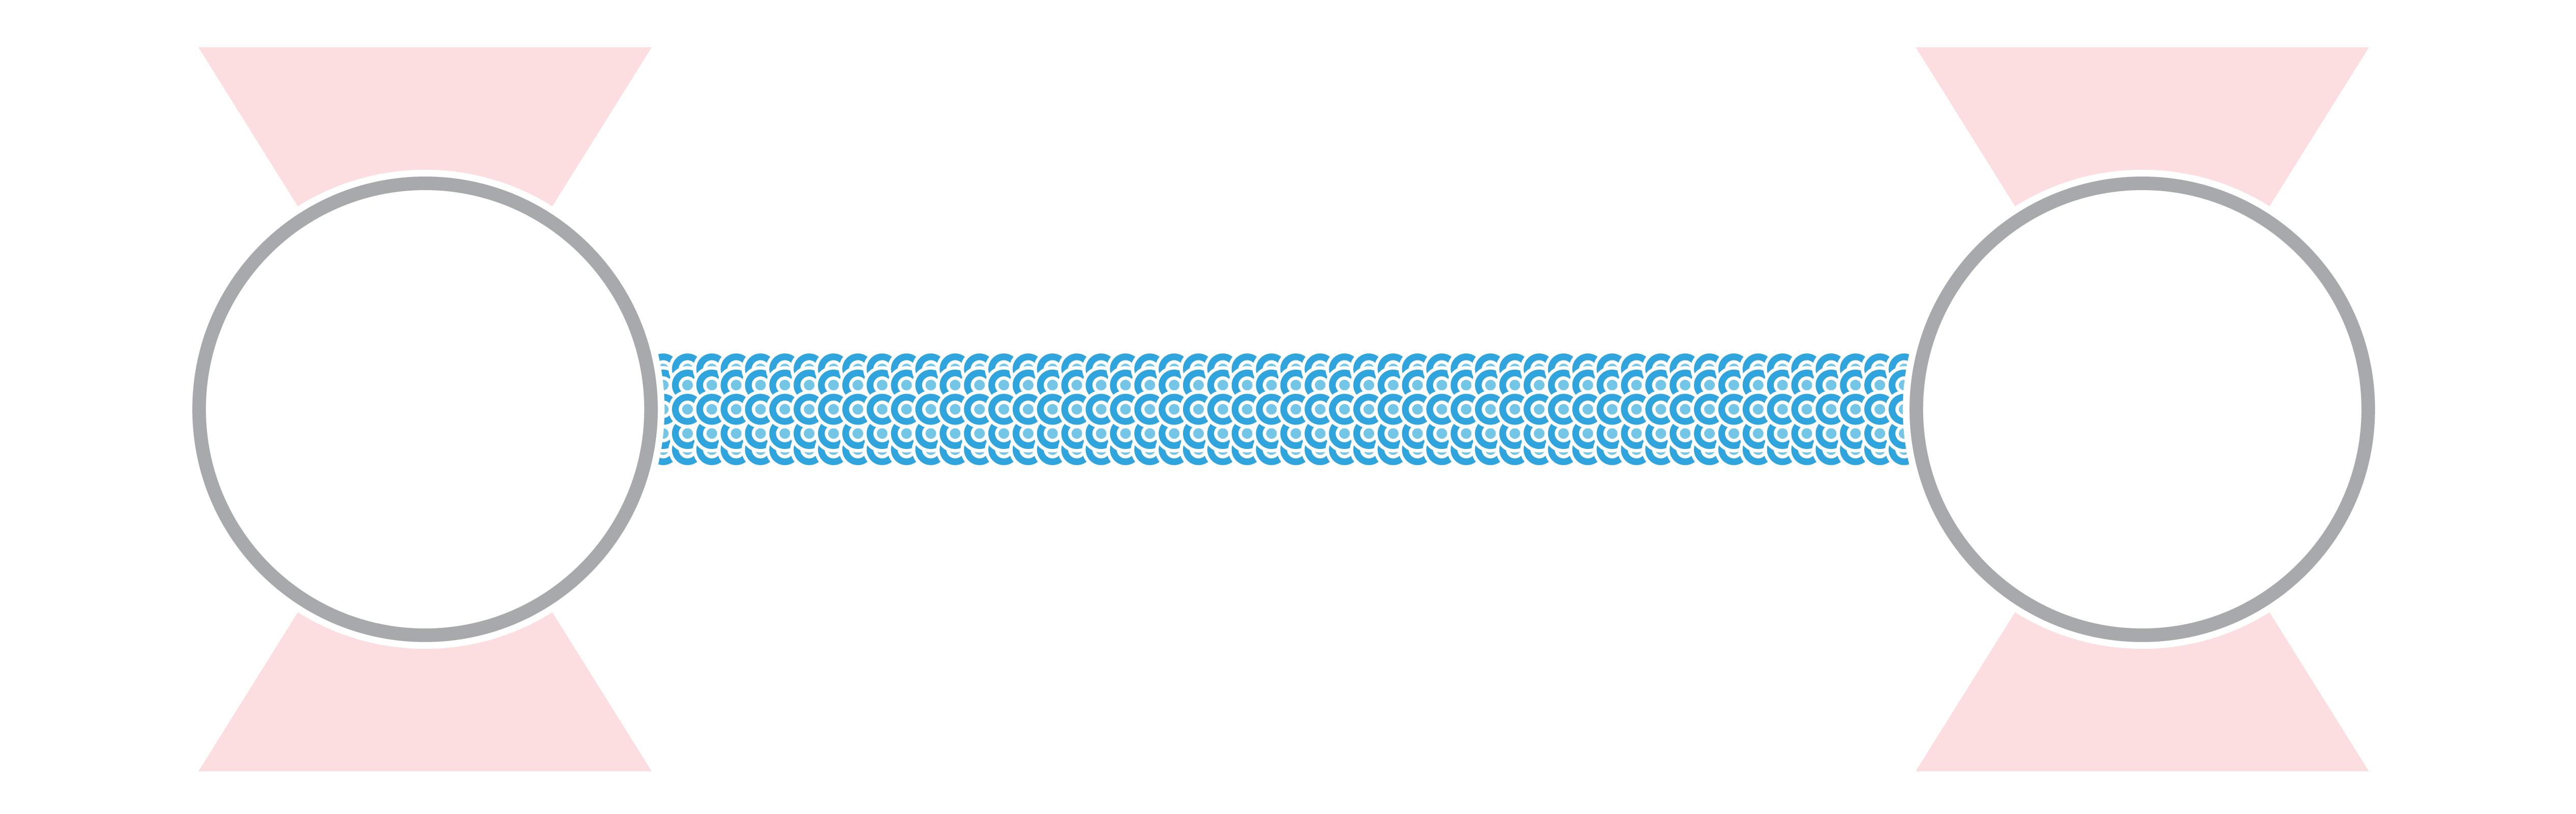 C Trap Cytoskeletal Transport Vimentin Filament